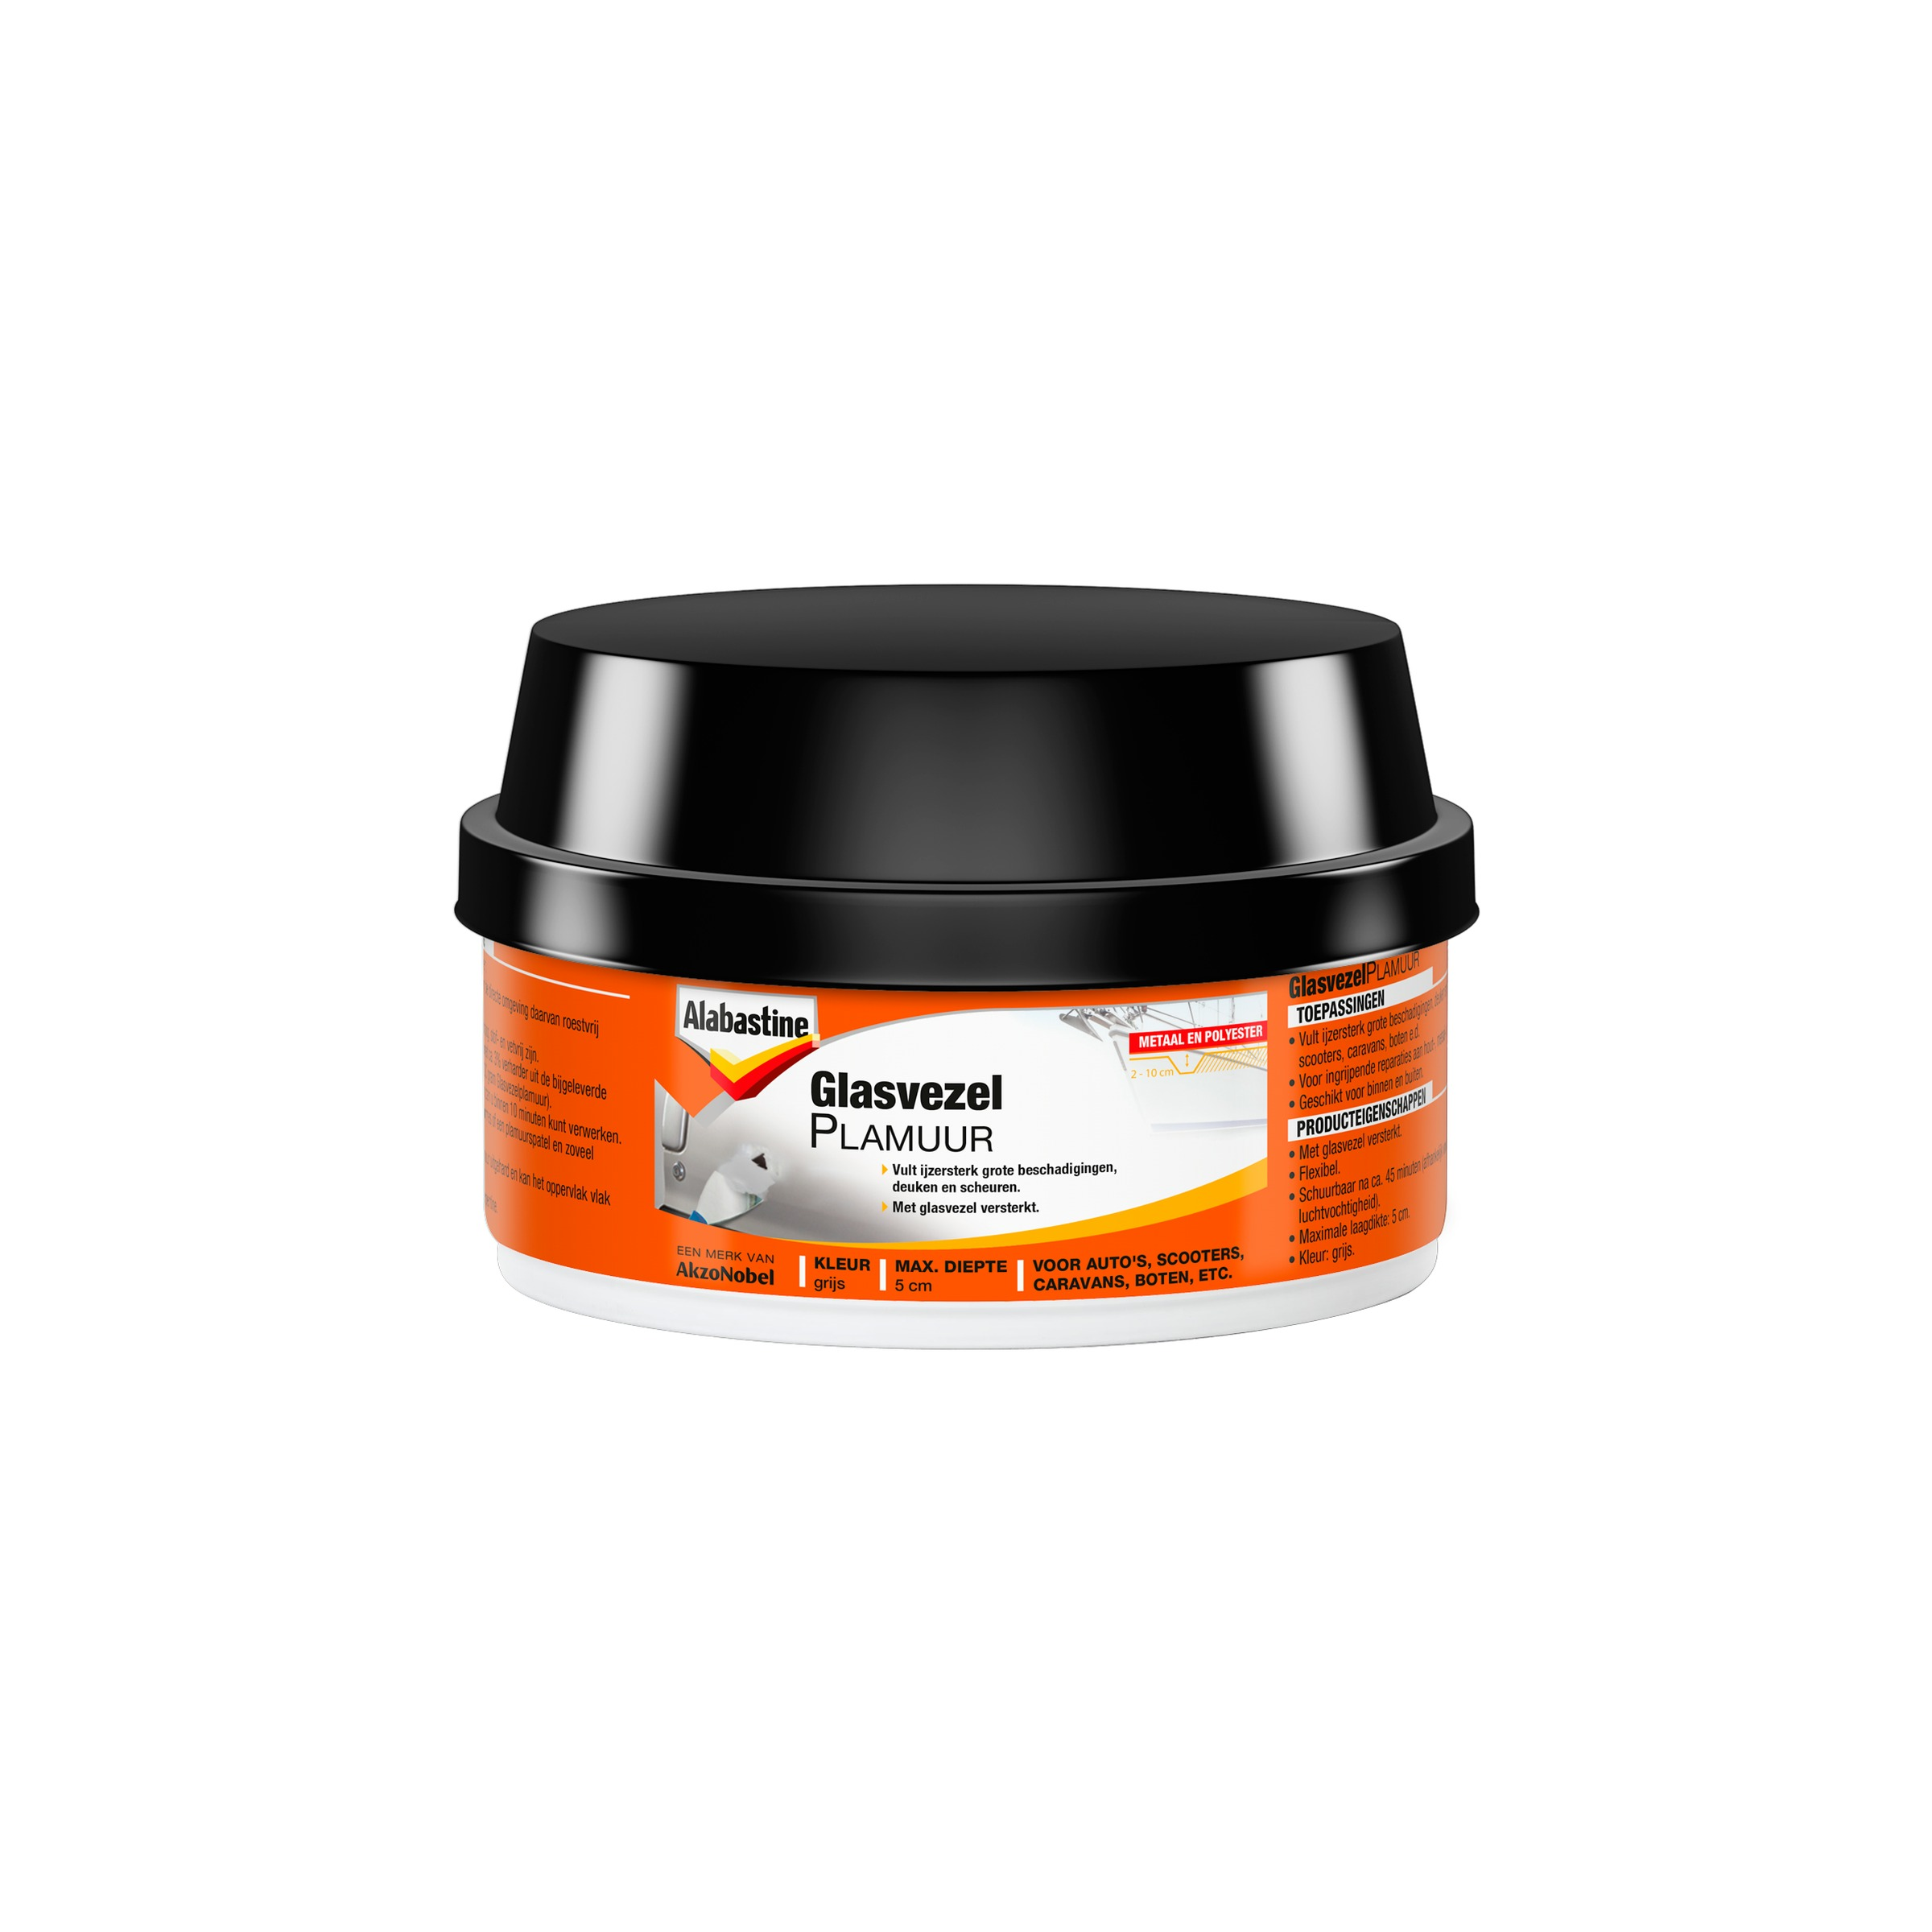 Alabastine glasvezelplamuur 250 g